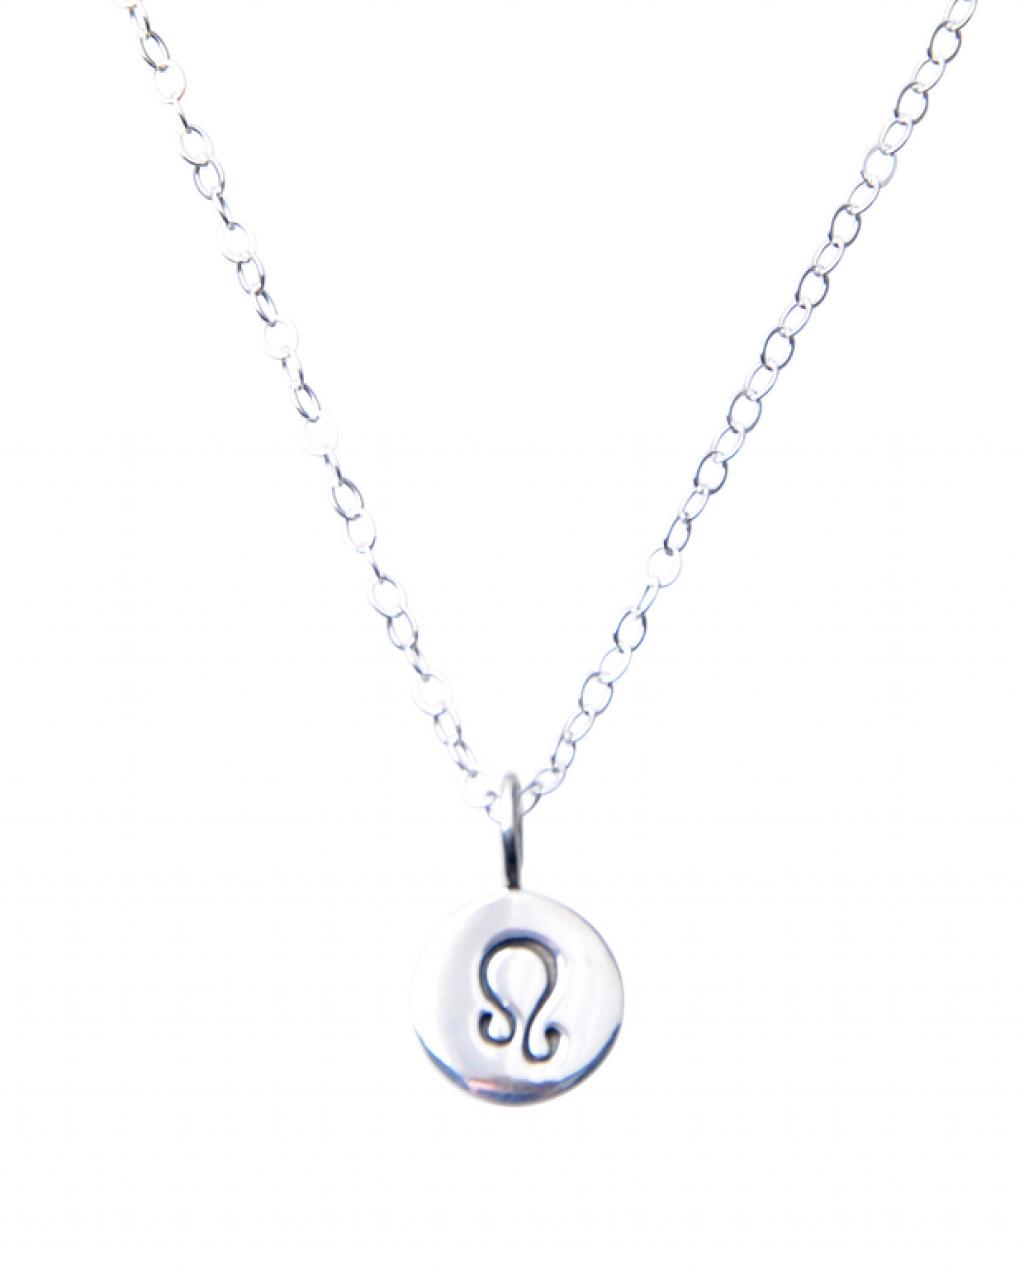 Pam Kerr Designs | Sterling Silver Zodiac Charm Necklace | 5-Leo